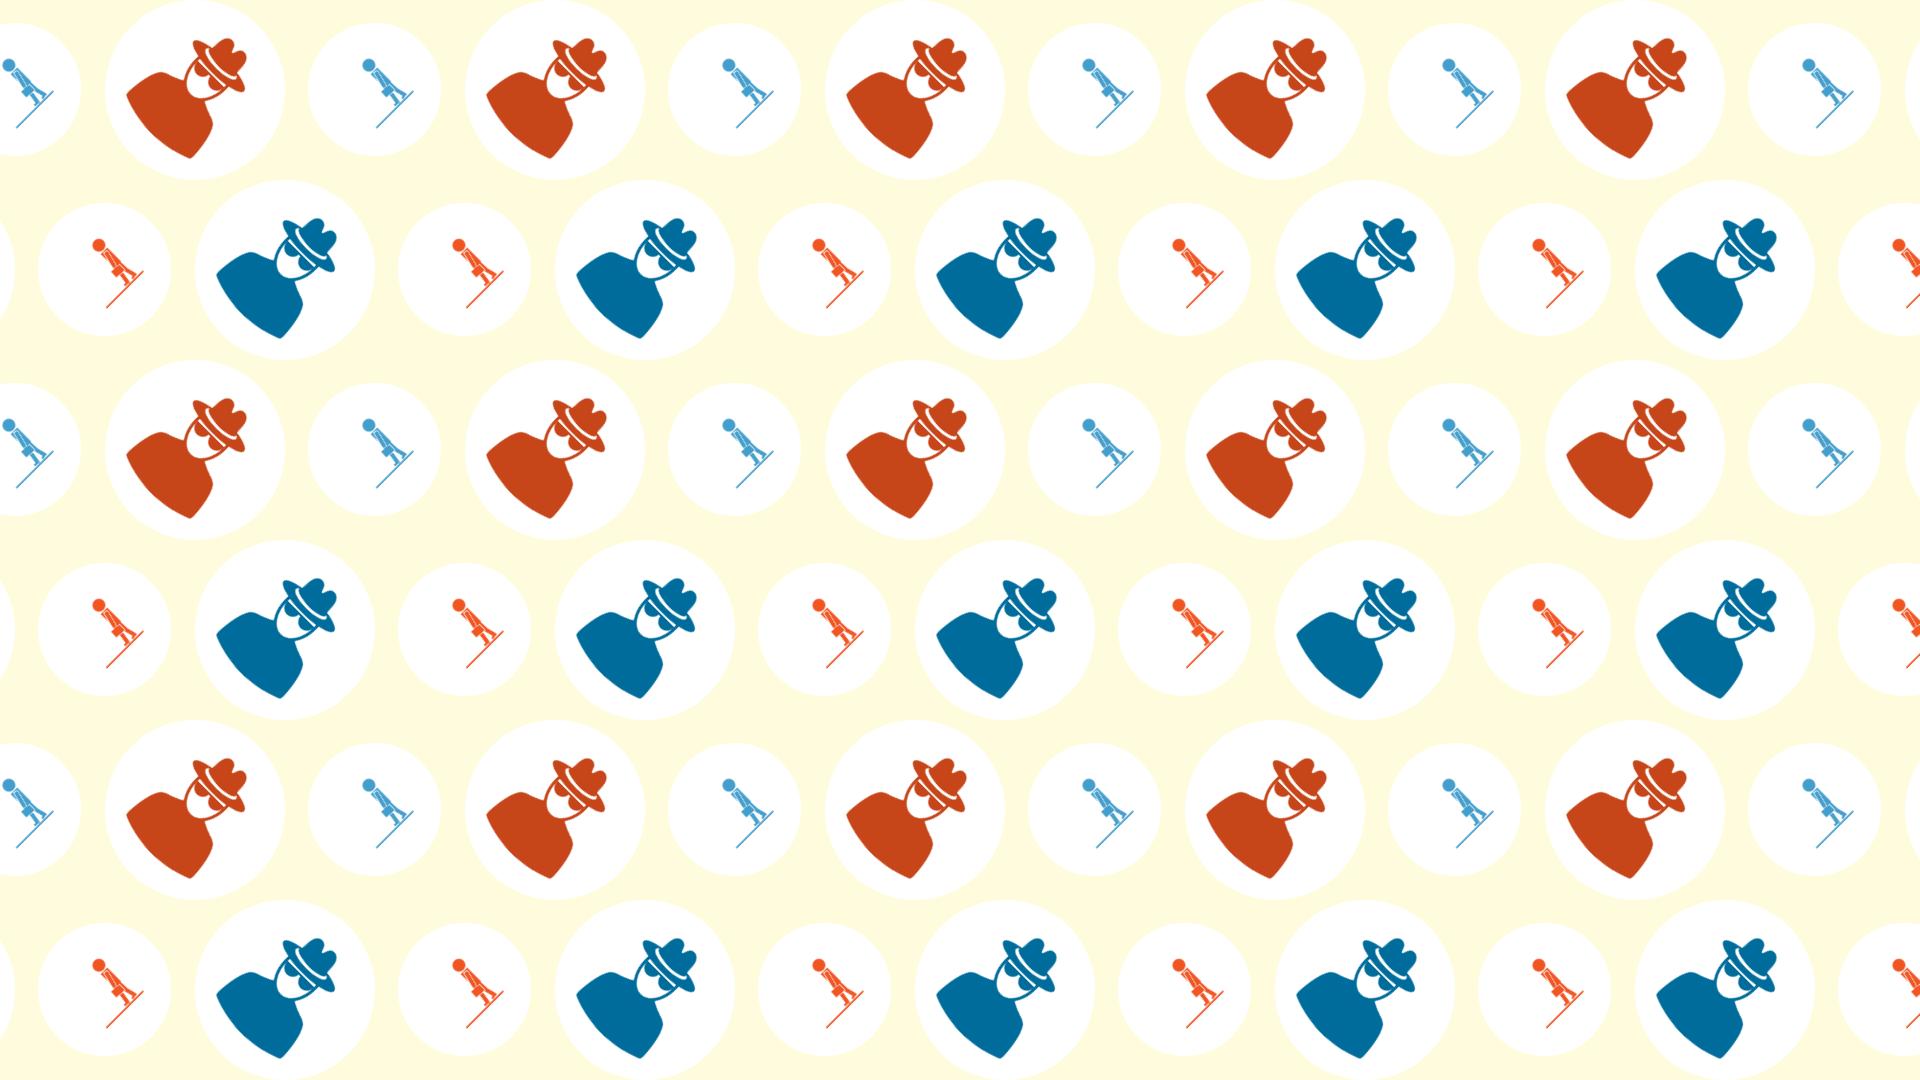 Pattern, Design, Petal, Line, Font, Heart, Professor, Male, Circles, Drum, Service, Shapes, Circle,  Free Image